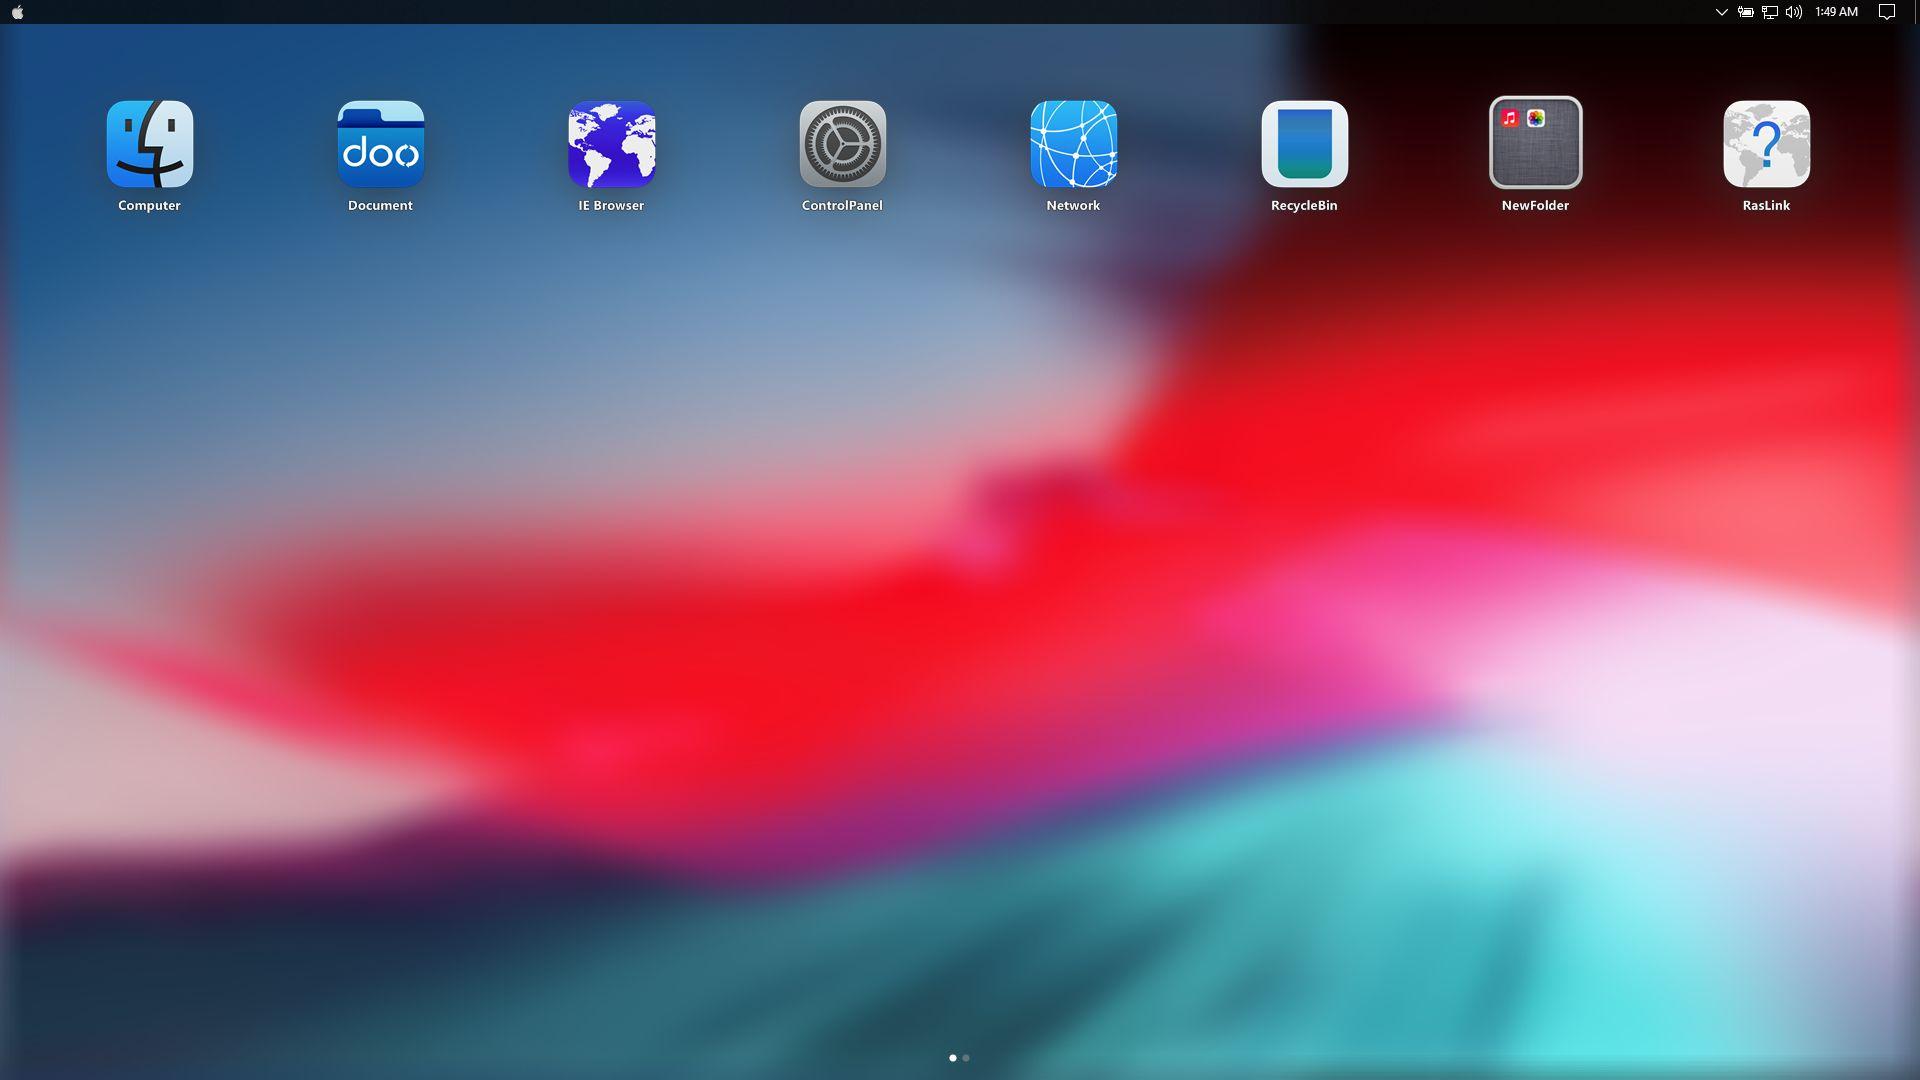 ios theme for windows 7 32 bit free download